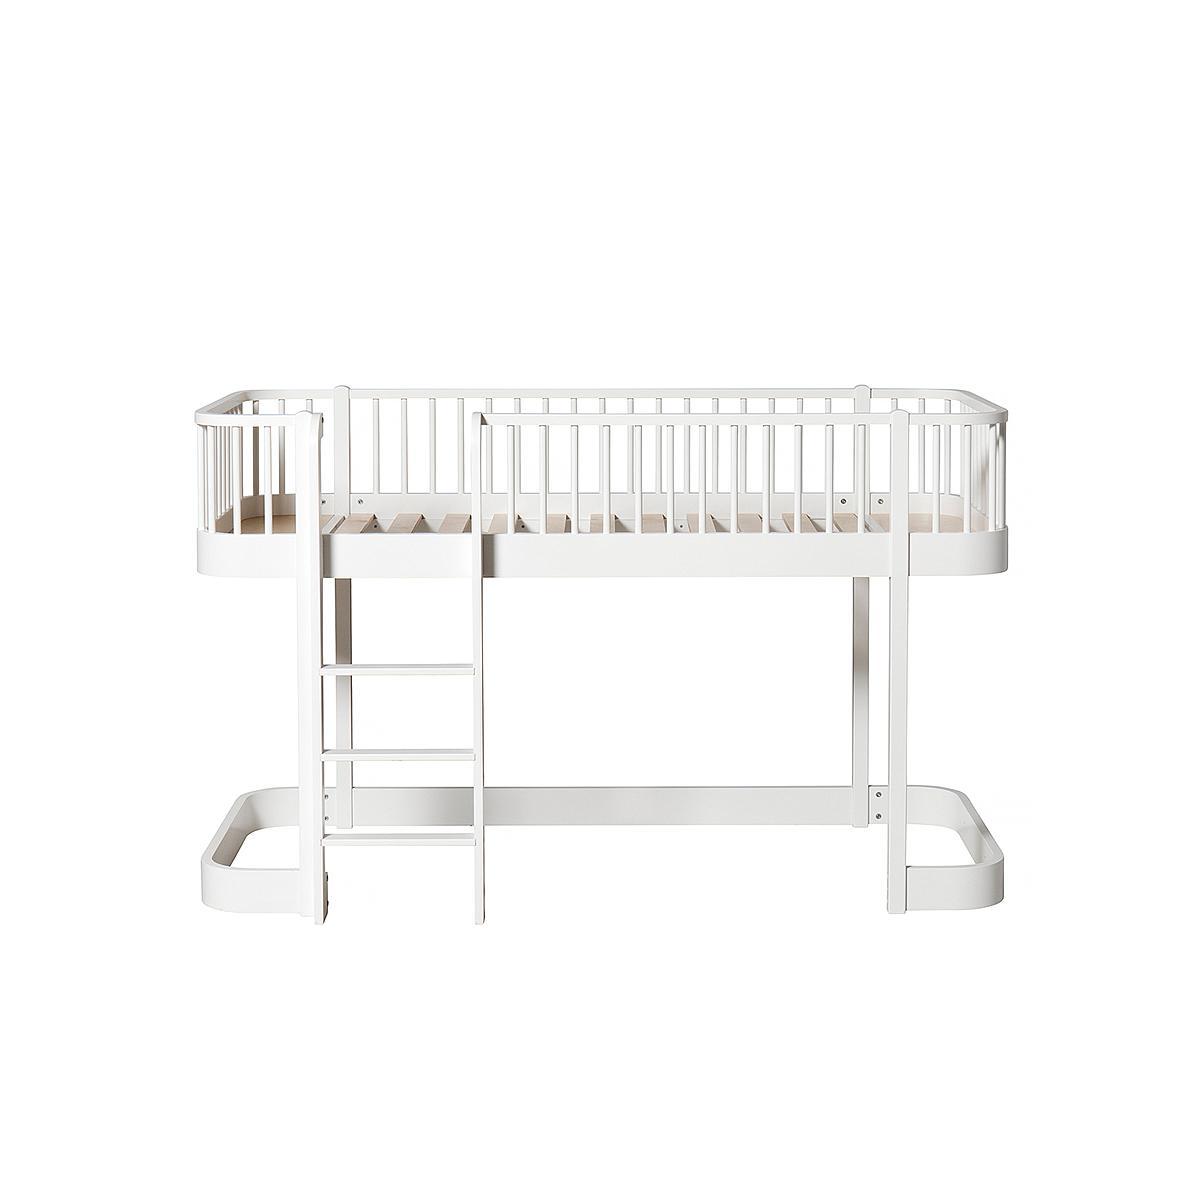 Lit évolutif mi hauteur 90x200cm WOOD ORIGINAL Oliver Furniture blanc